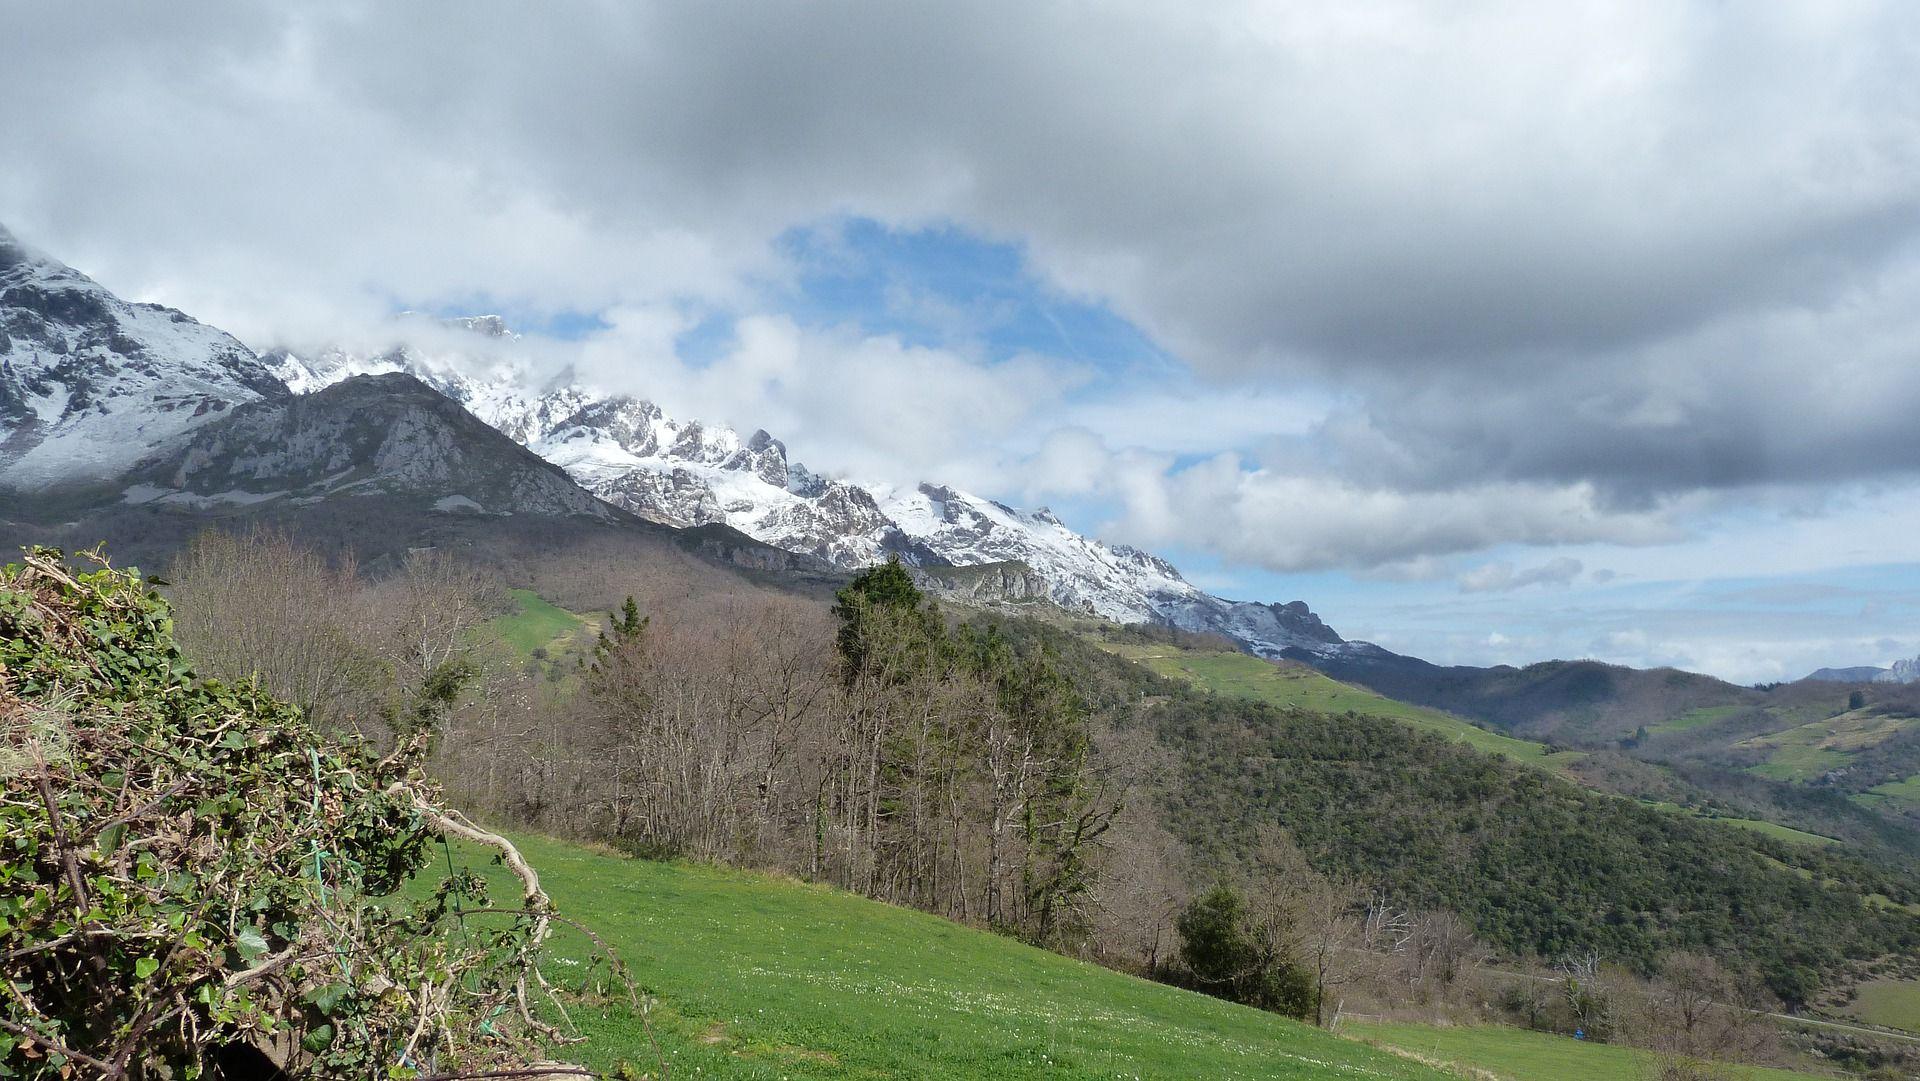 Valle de Liebana con los Picos de Europa